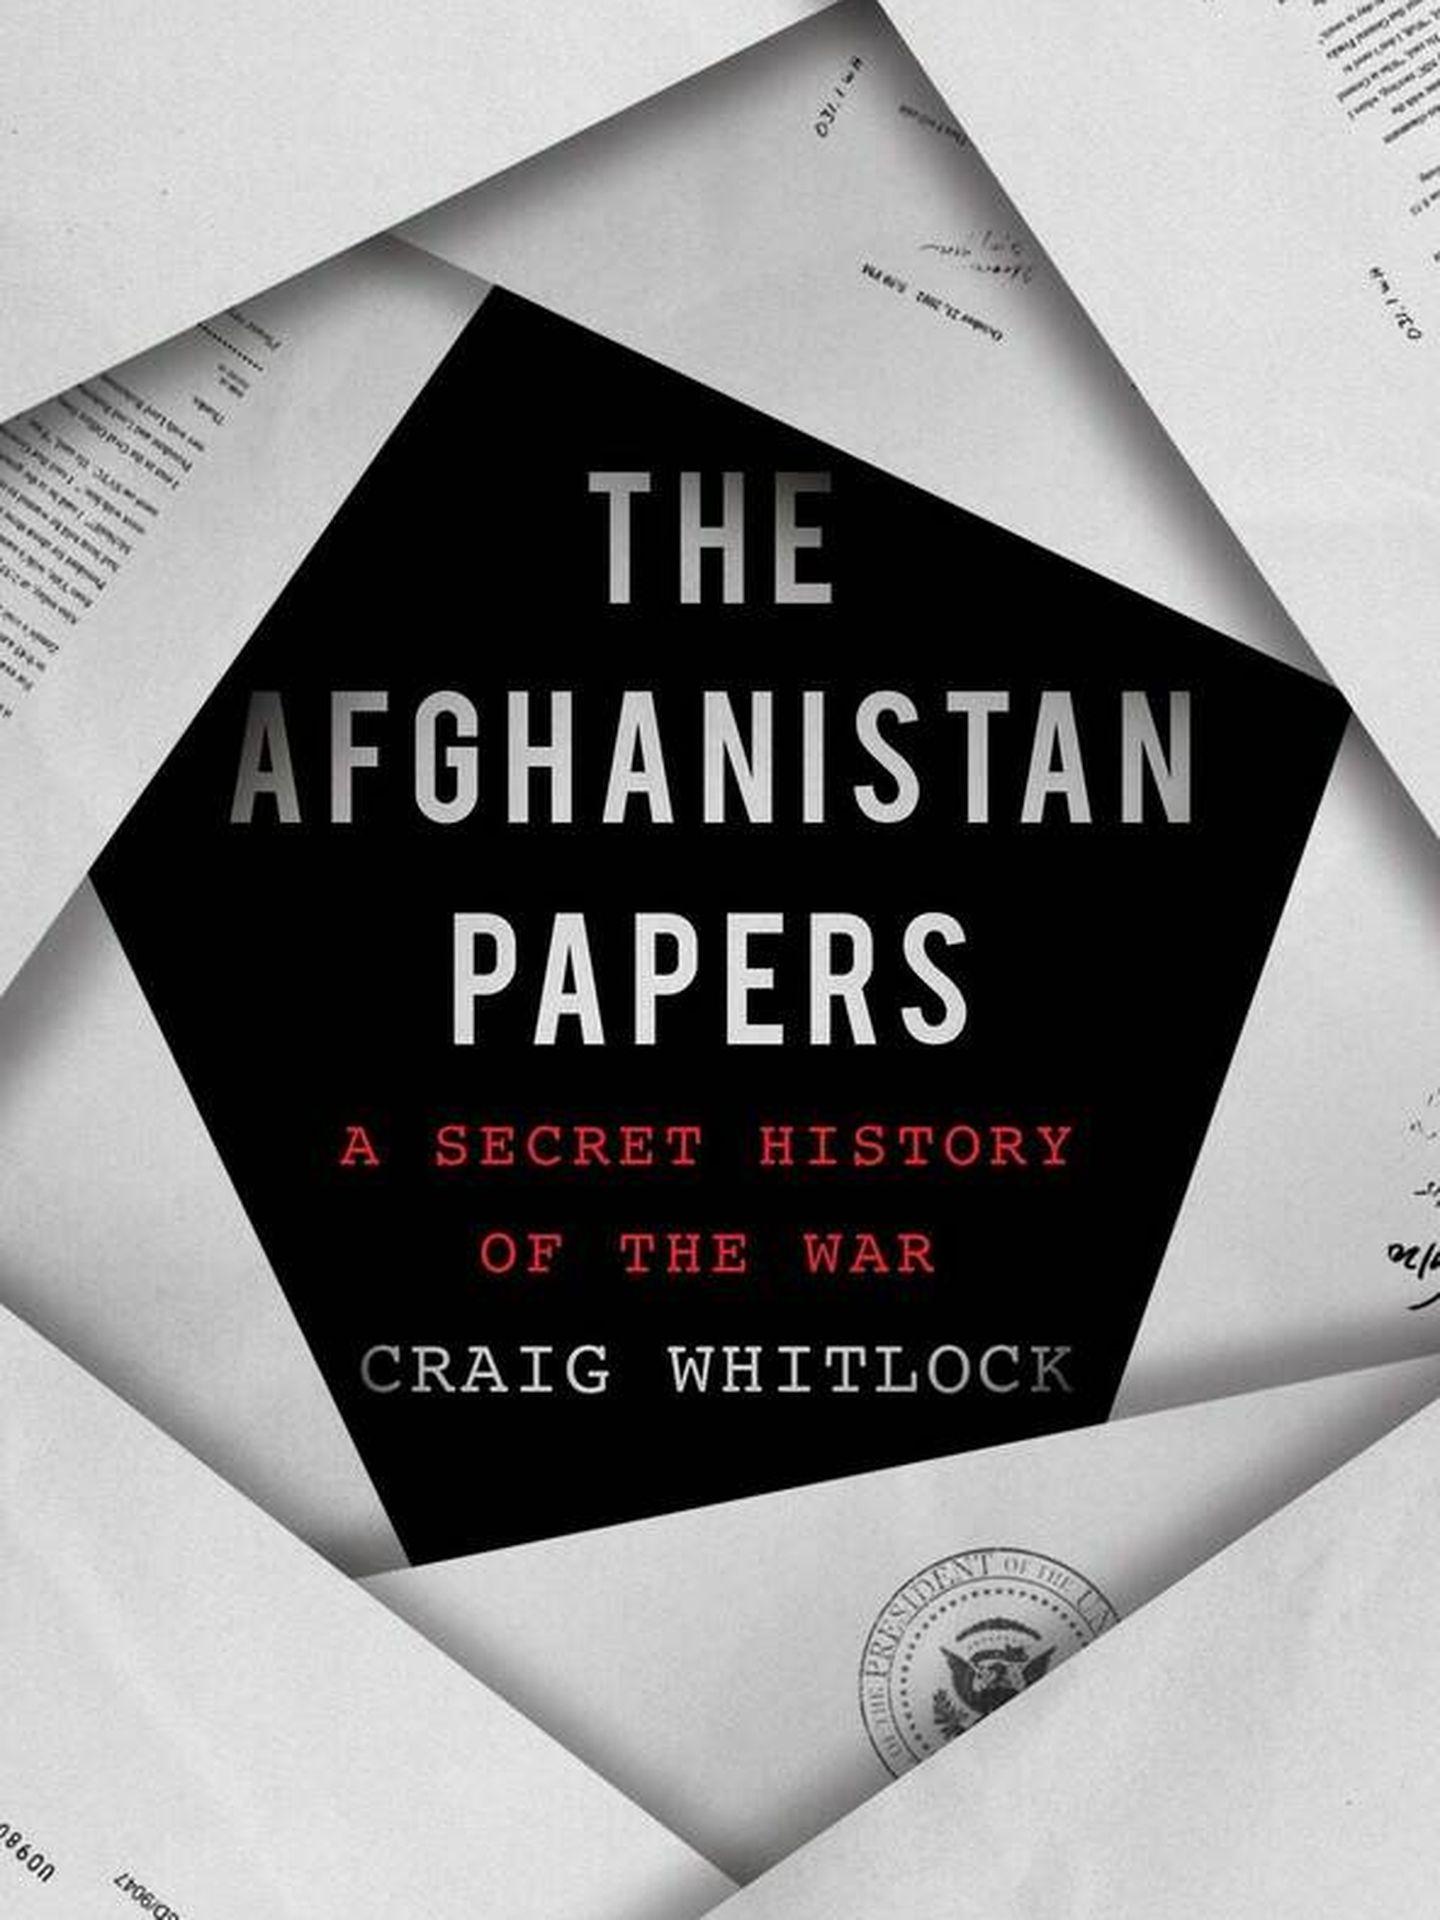 Portada del libro 'The Afghanistan Papers'. (Foto cedida)